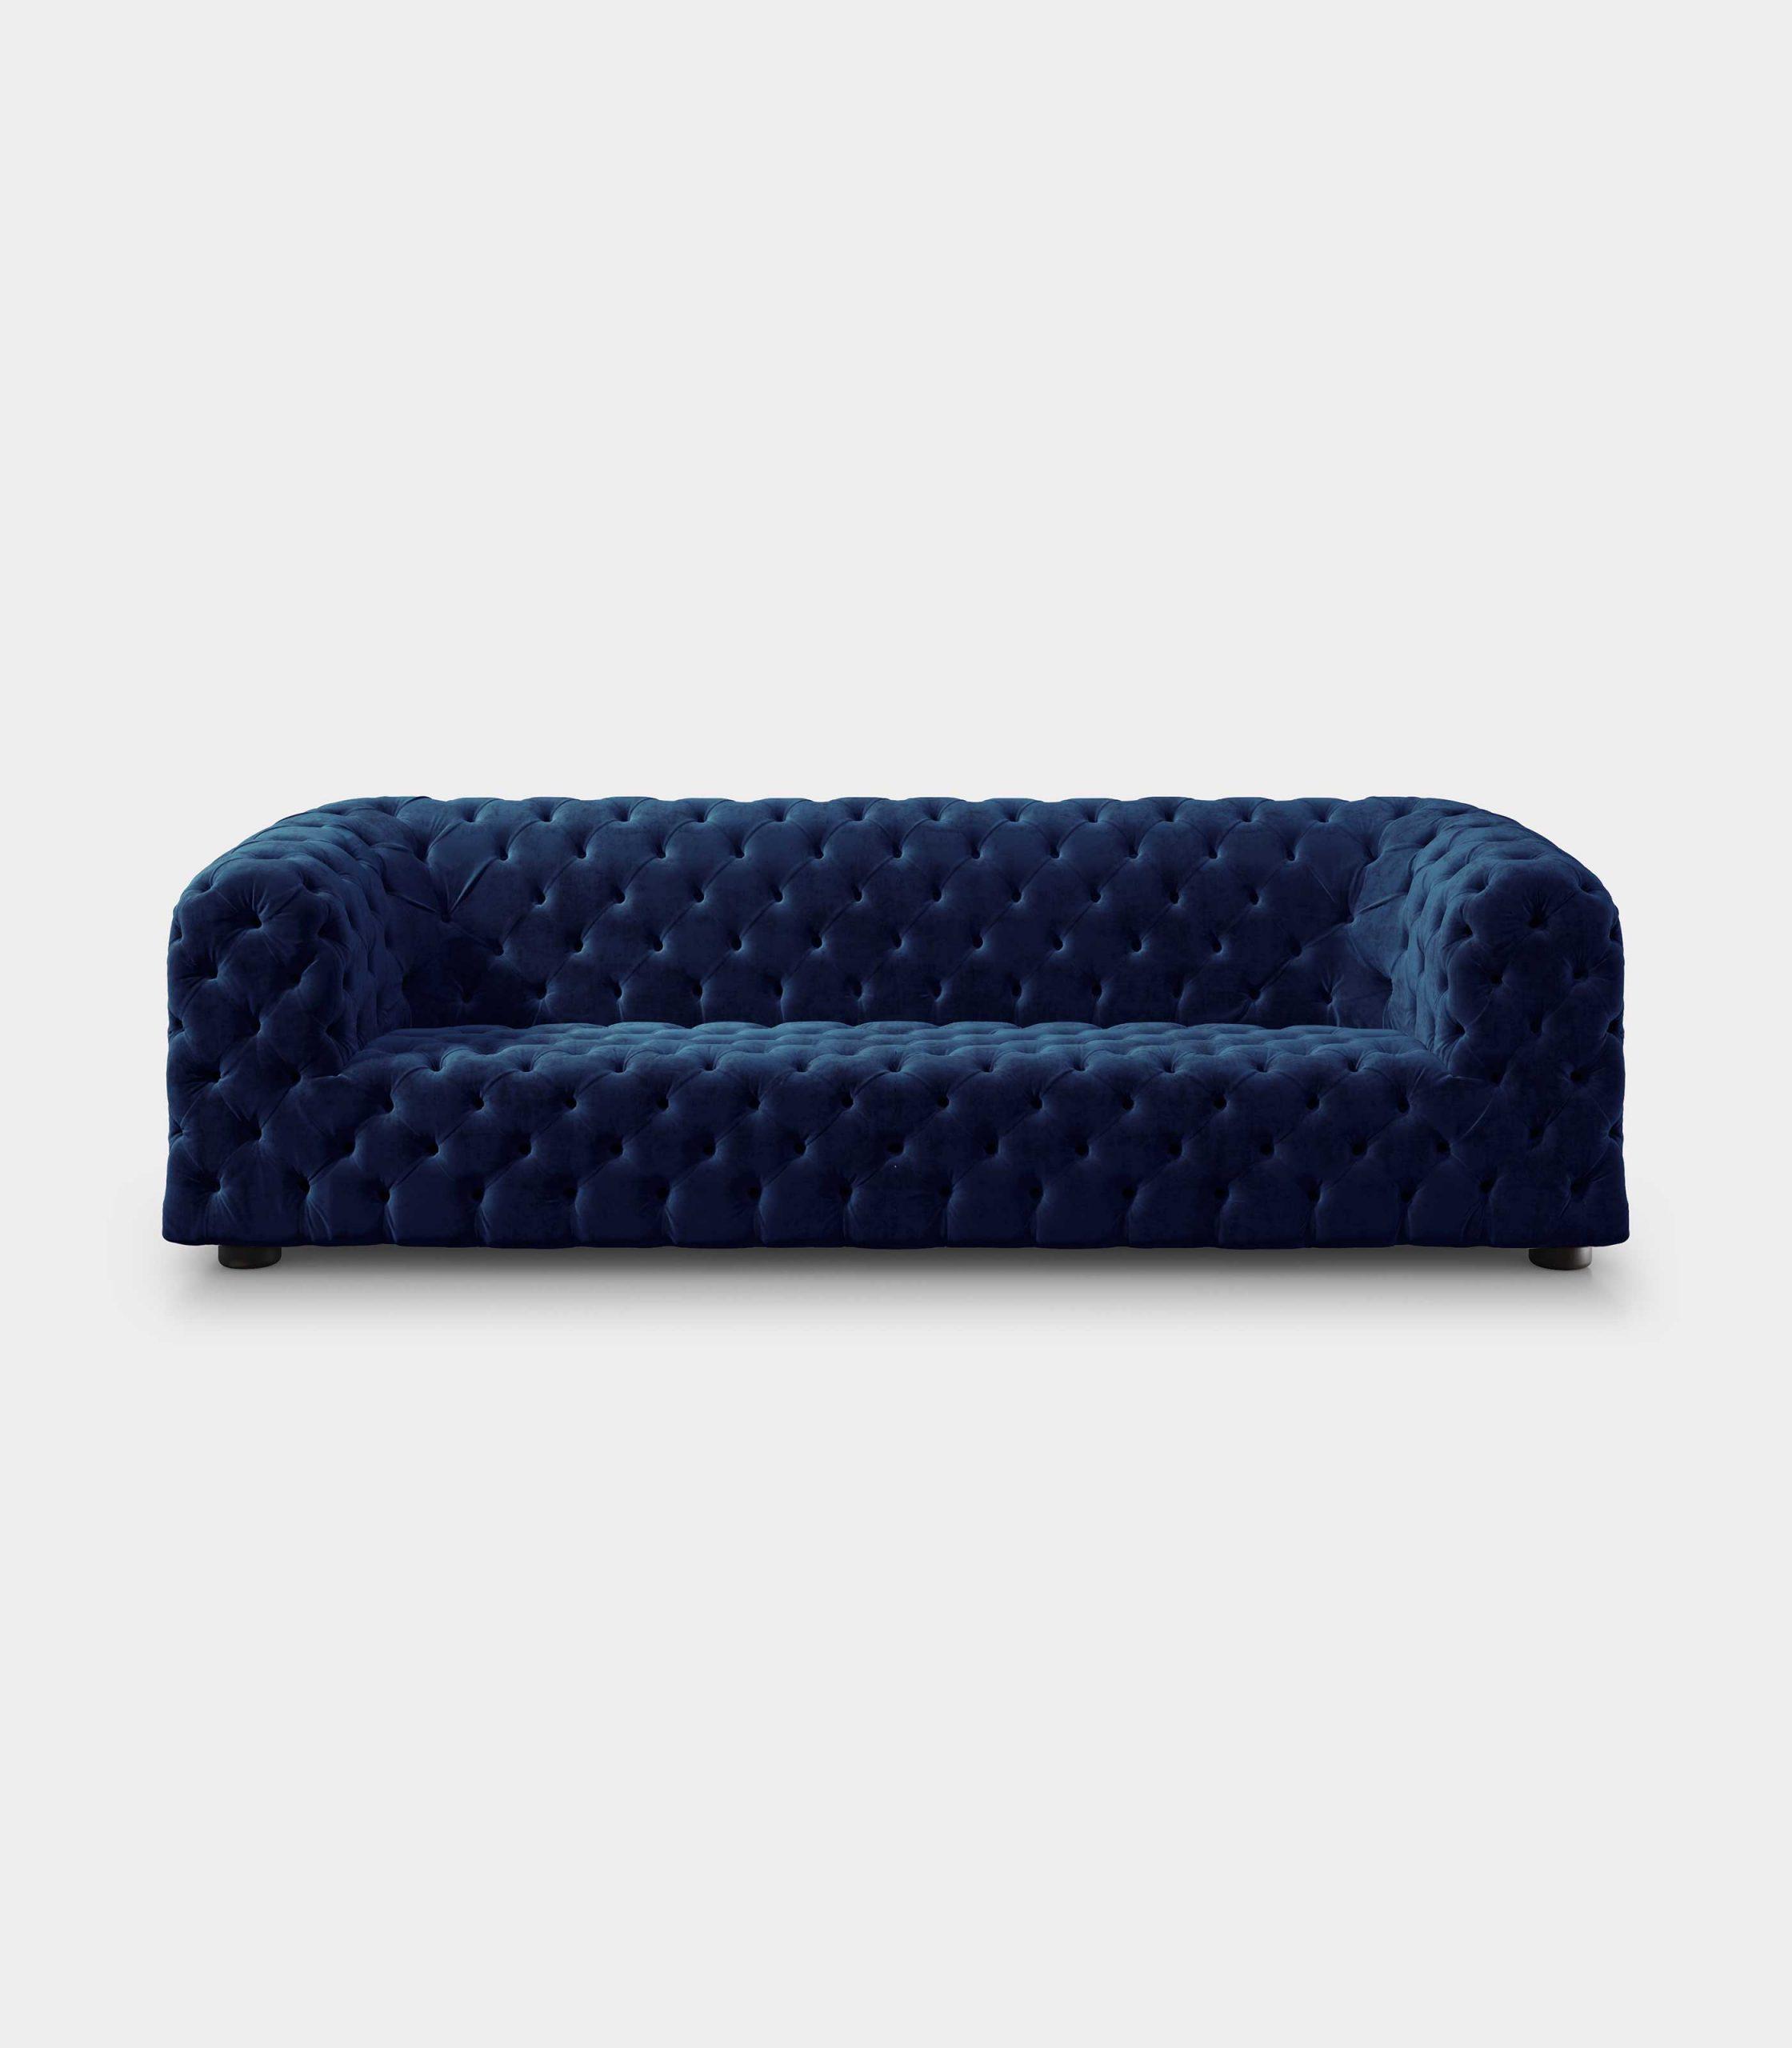 Capitonné blue velvet sofa loopo milan design F